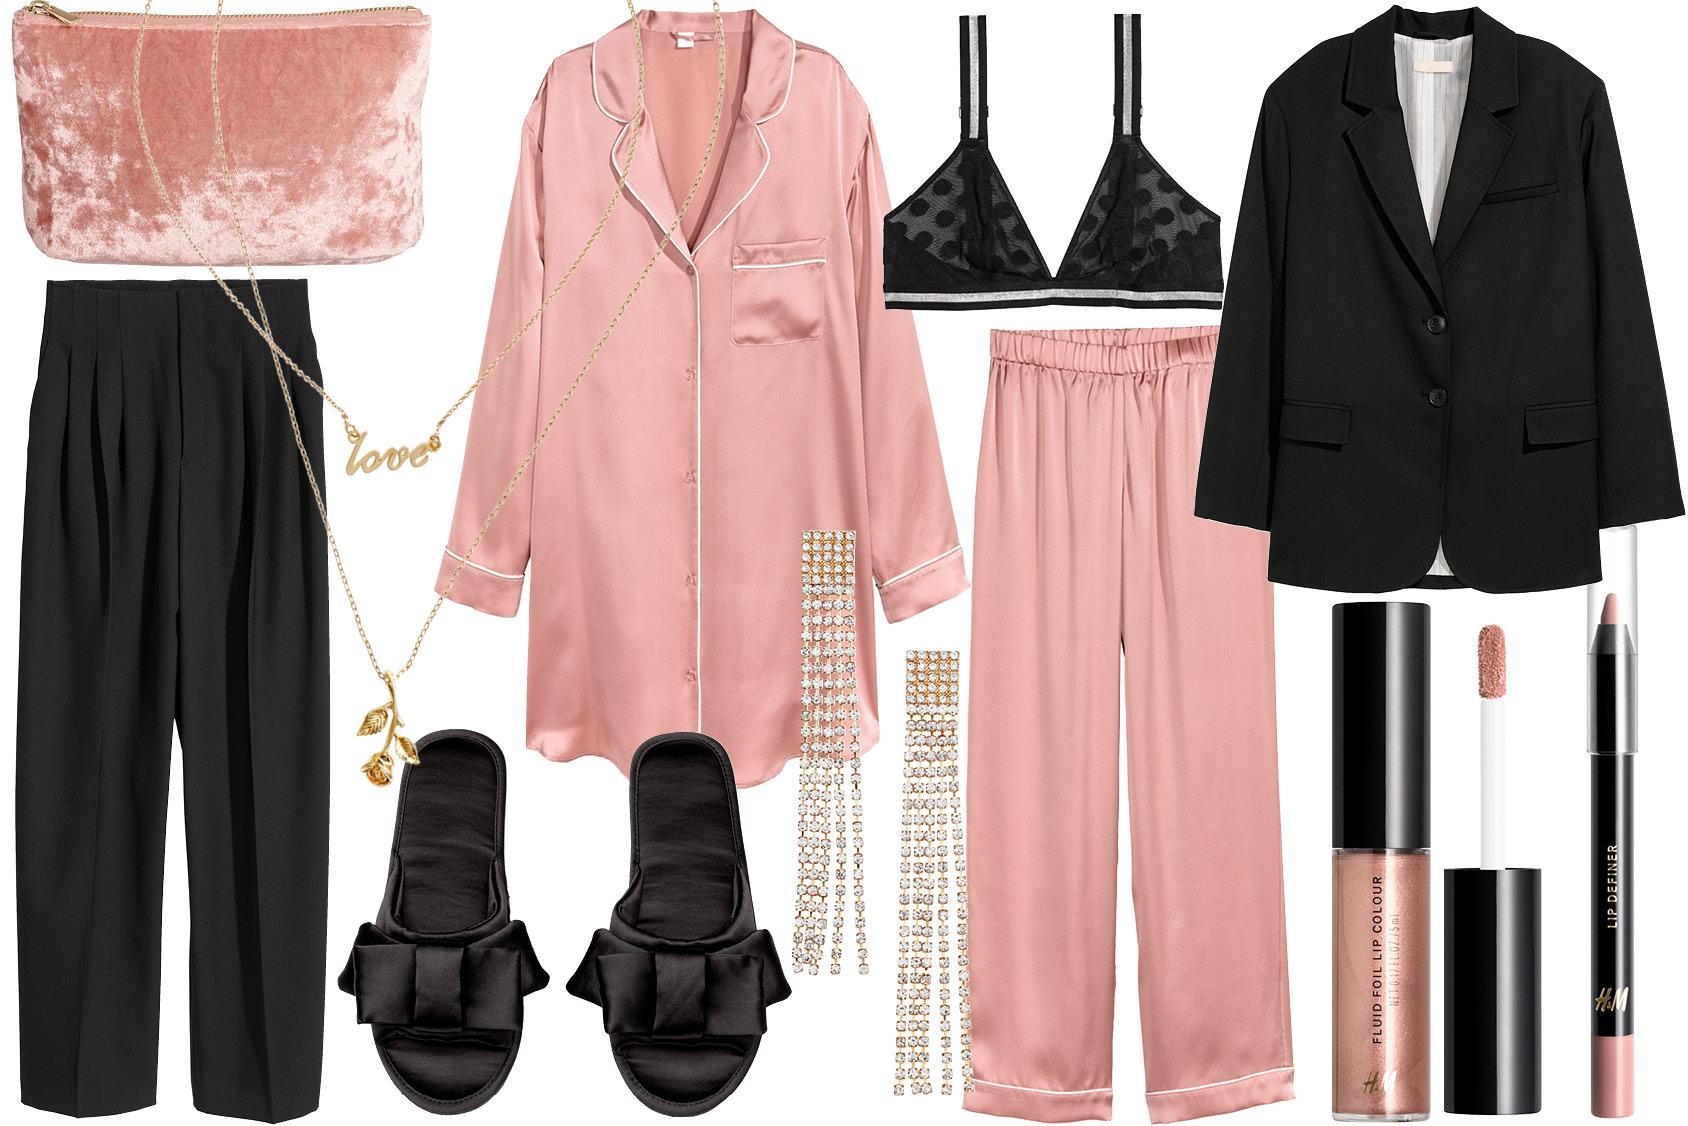 adidas outlet store carlsbad ca 92009 zip code adidas superstar women pink gold